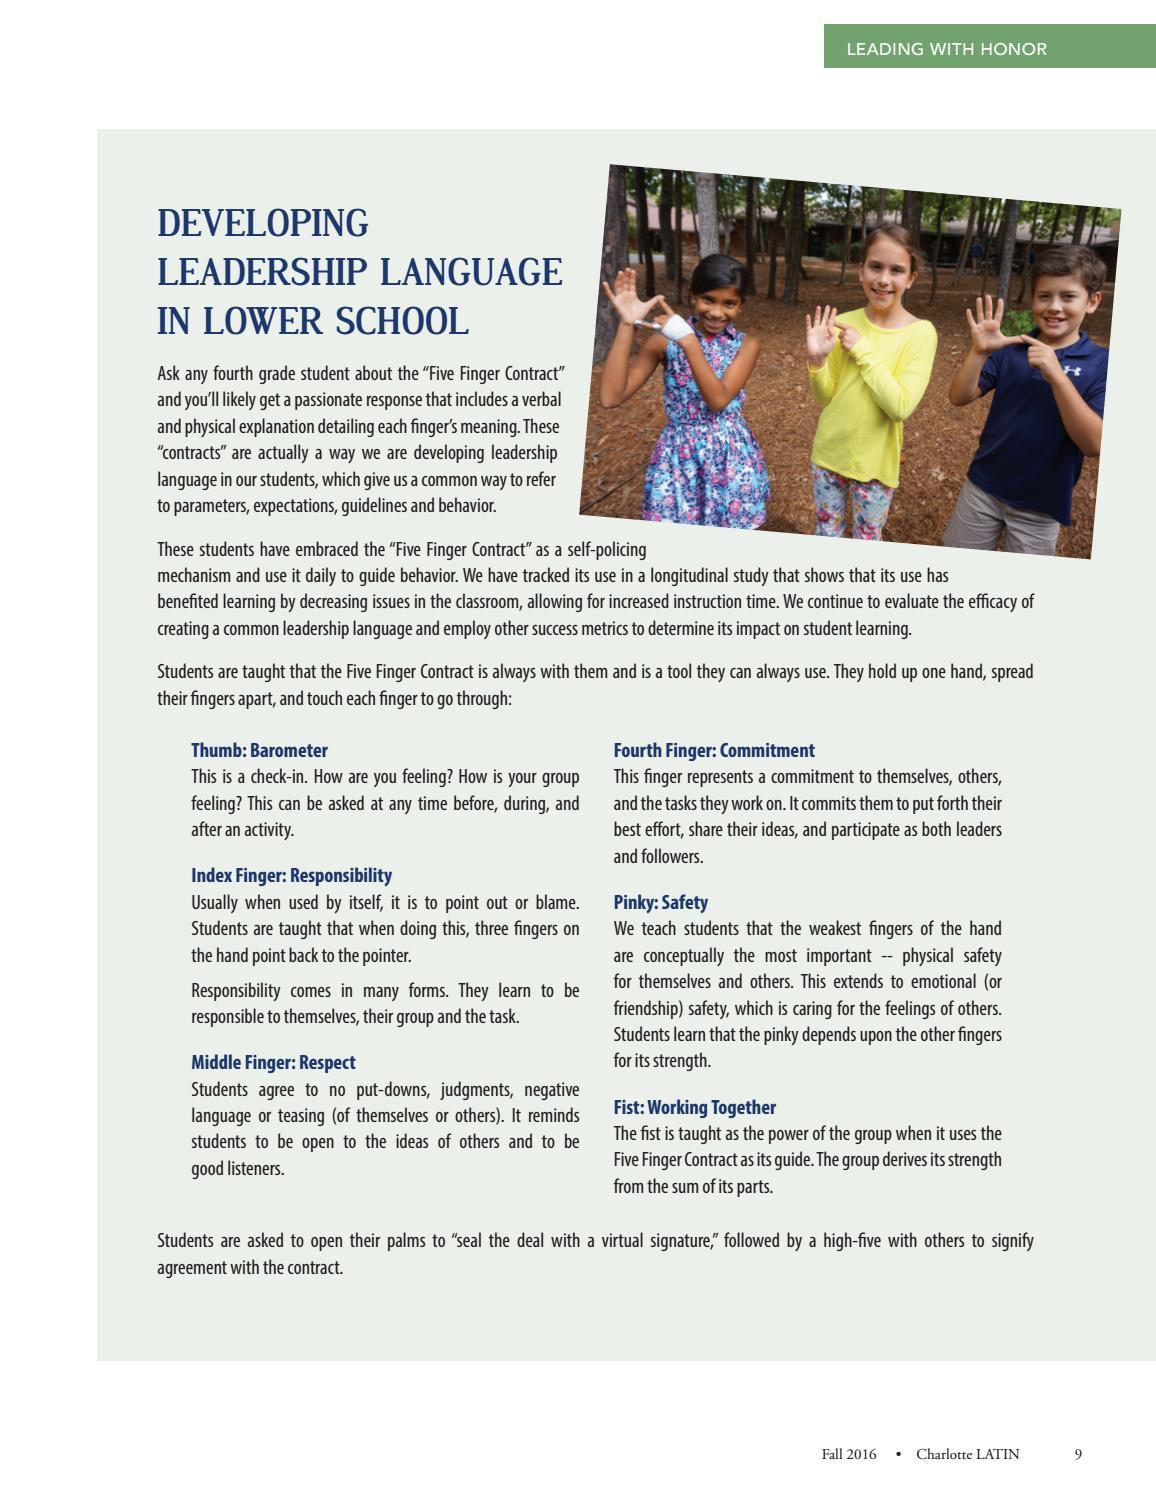 Charlotte Latin Magazine October 2016 By Charlotte Latin School